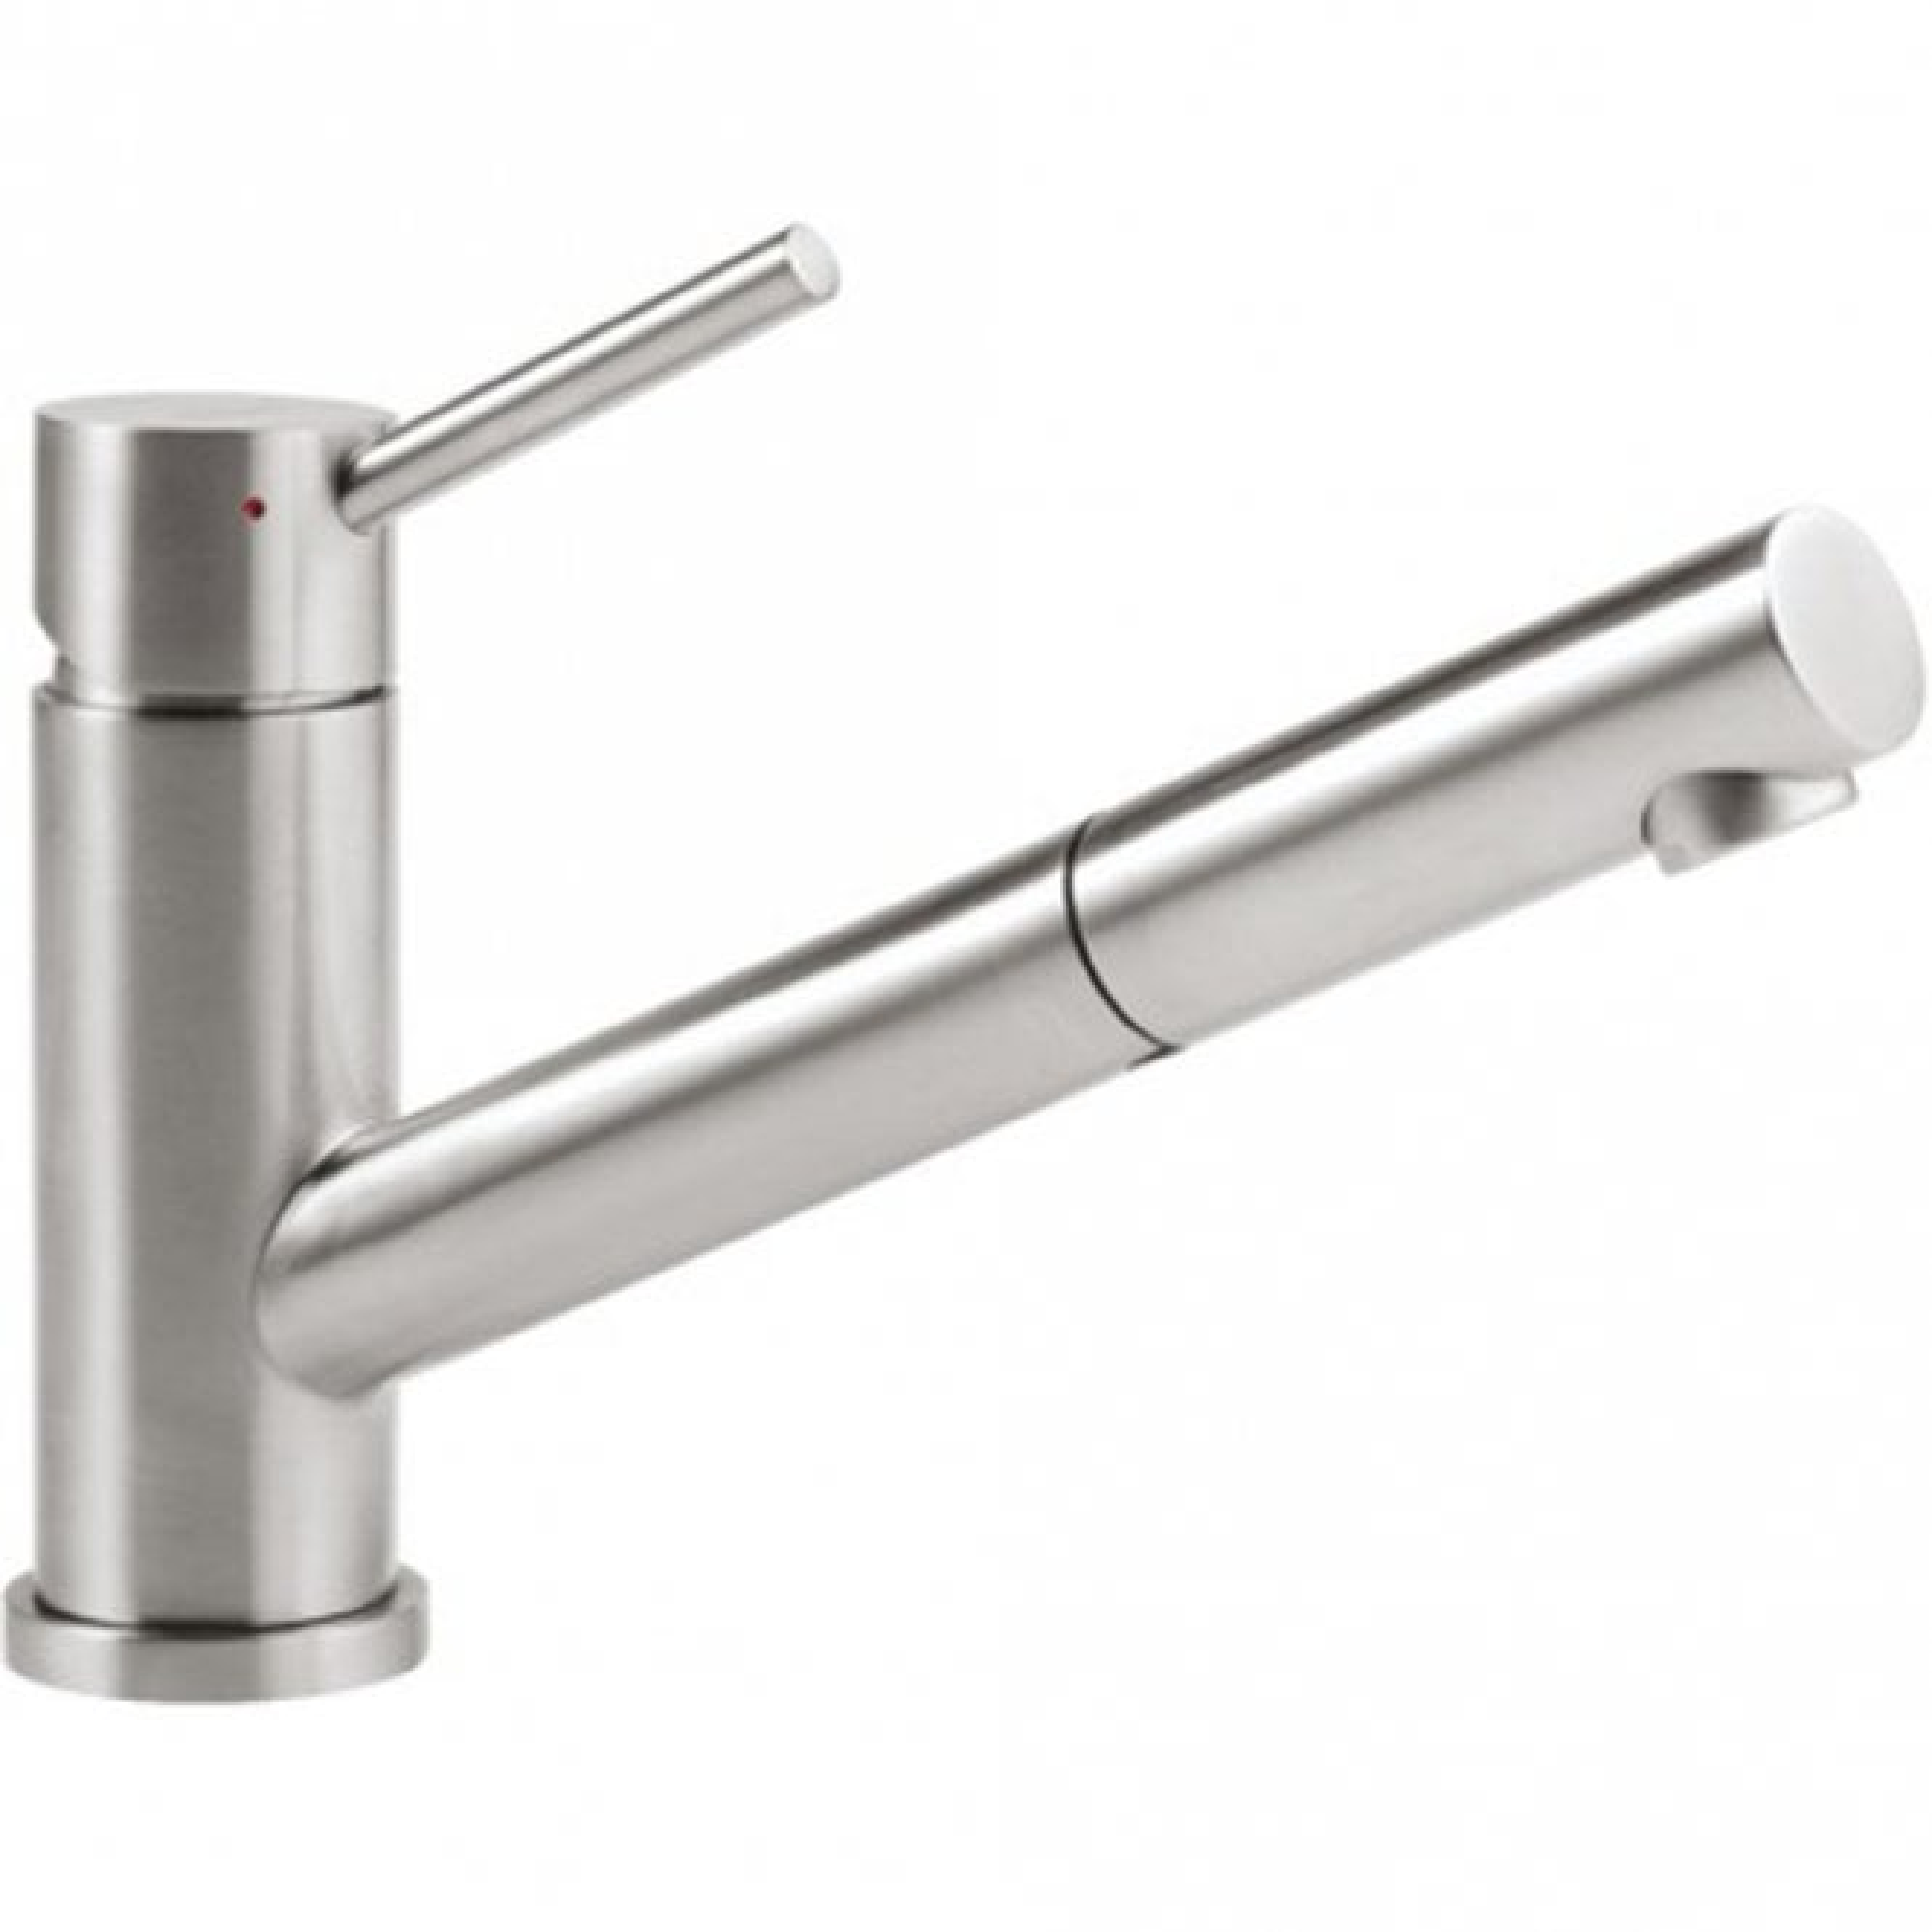 Villeroy & Boch Como Shower S/s Pullout Rinser Kitchen Sink Mixer ...